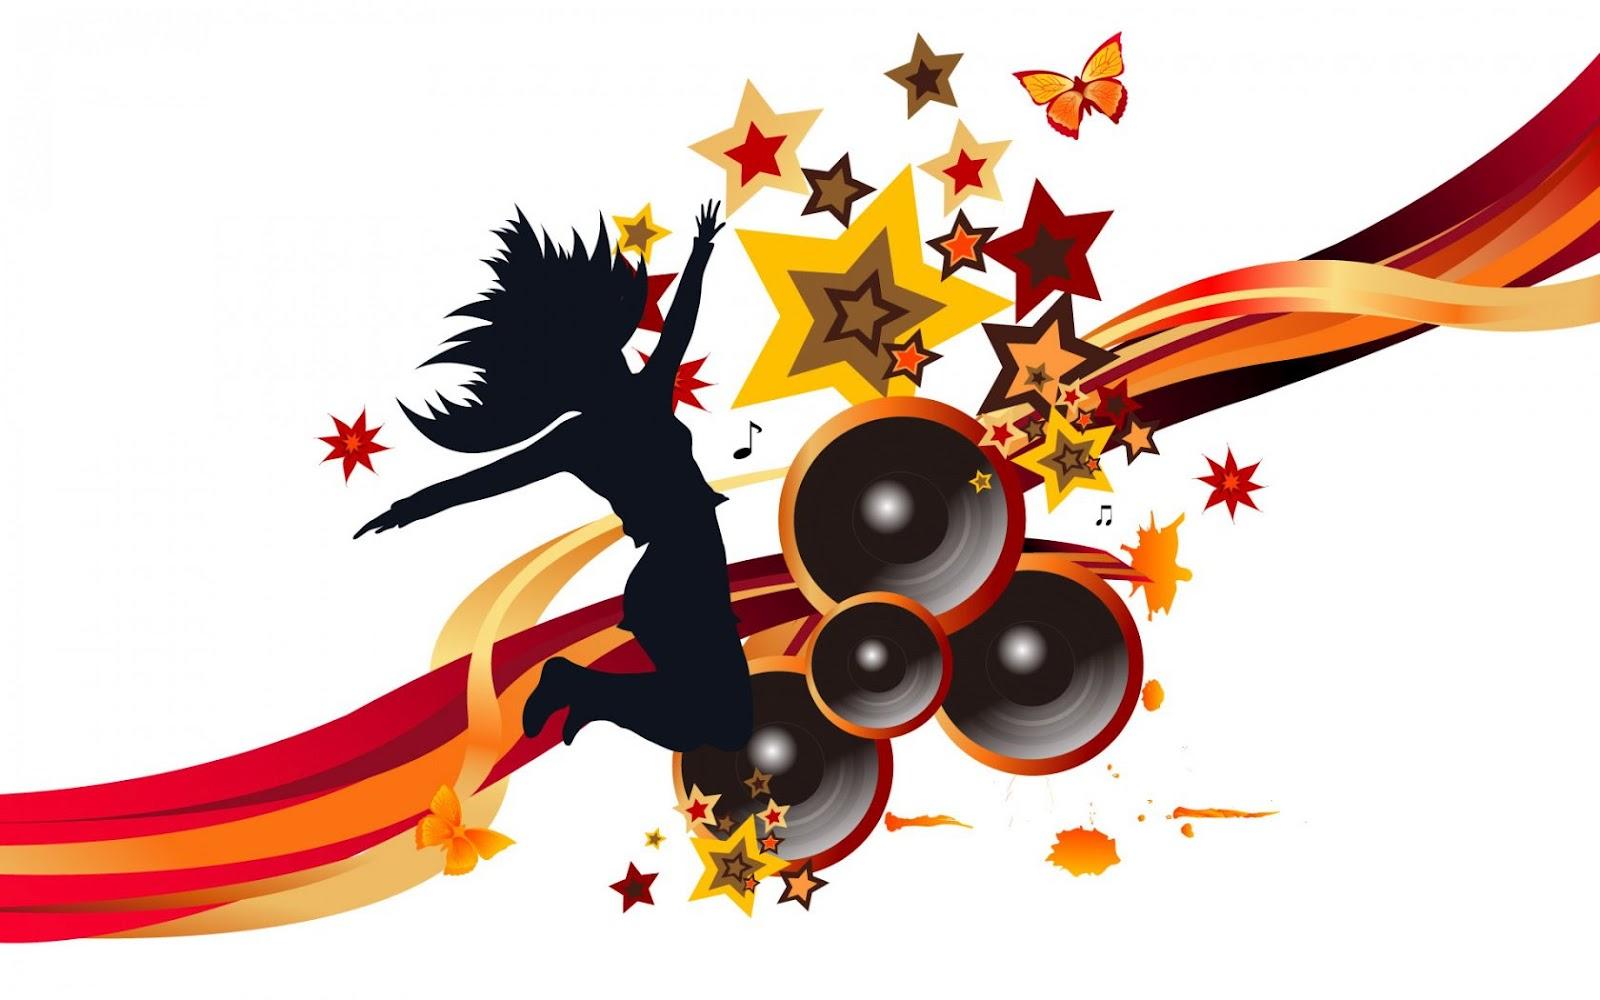 http://2.bp.blogspot.com/-FJ9bx_GtX3Y/T7YukQ7PWCI/AAAAAAAACRE/vYy-C9FsuPM/s1600/dancing-girl-5-1680x1050.jpg